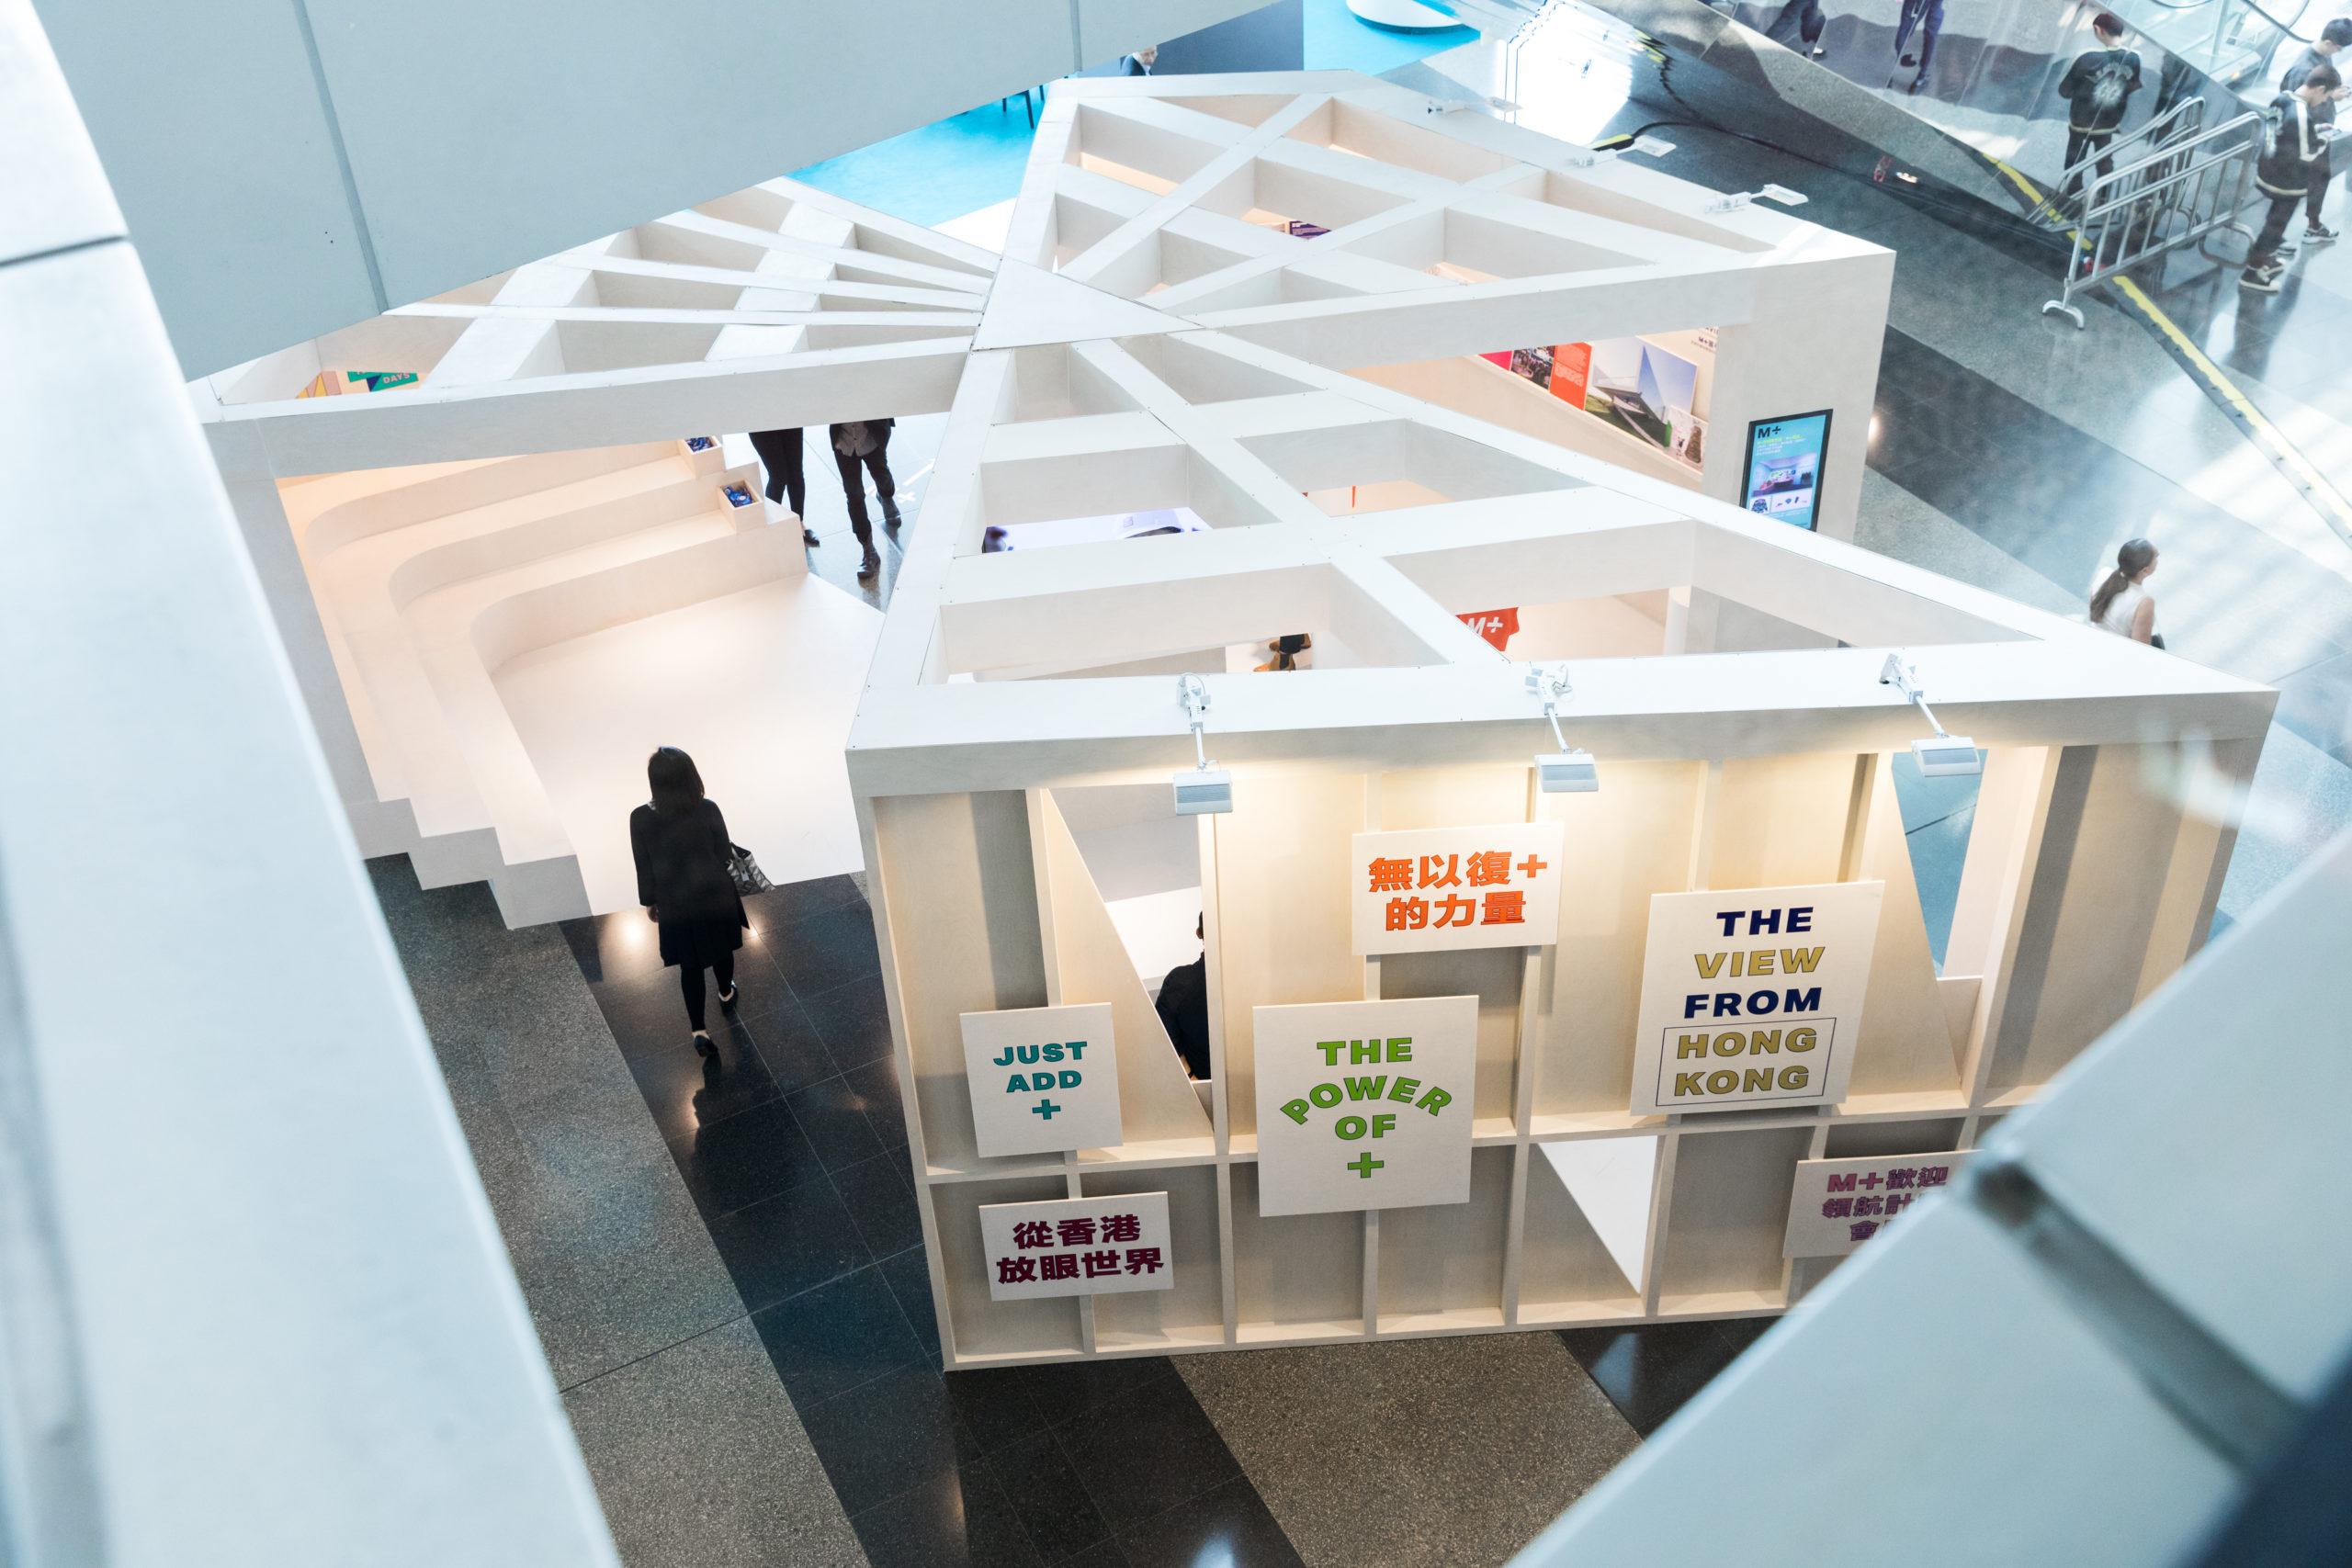 spatial practice architecture office Los Angeles Hong Kong m+ museum pavilion art basel hong kong